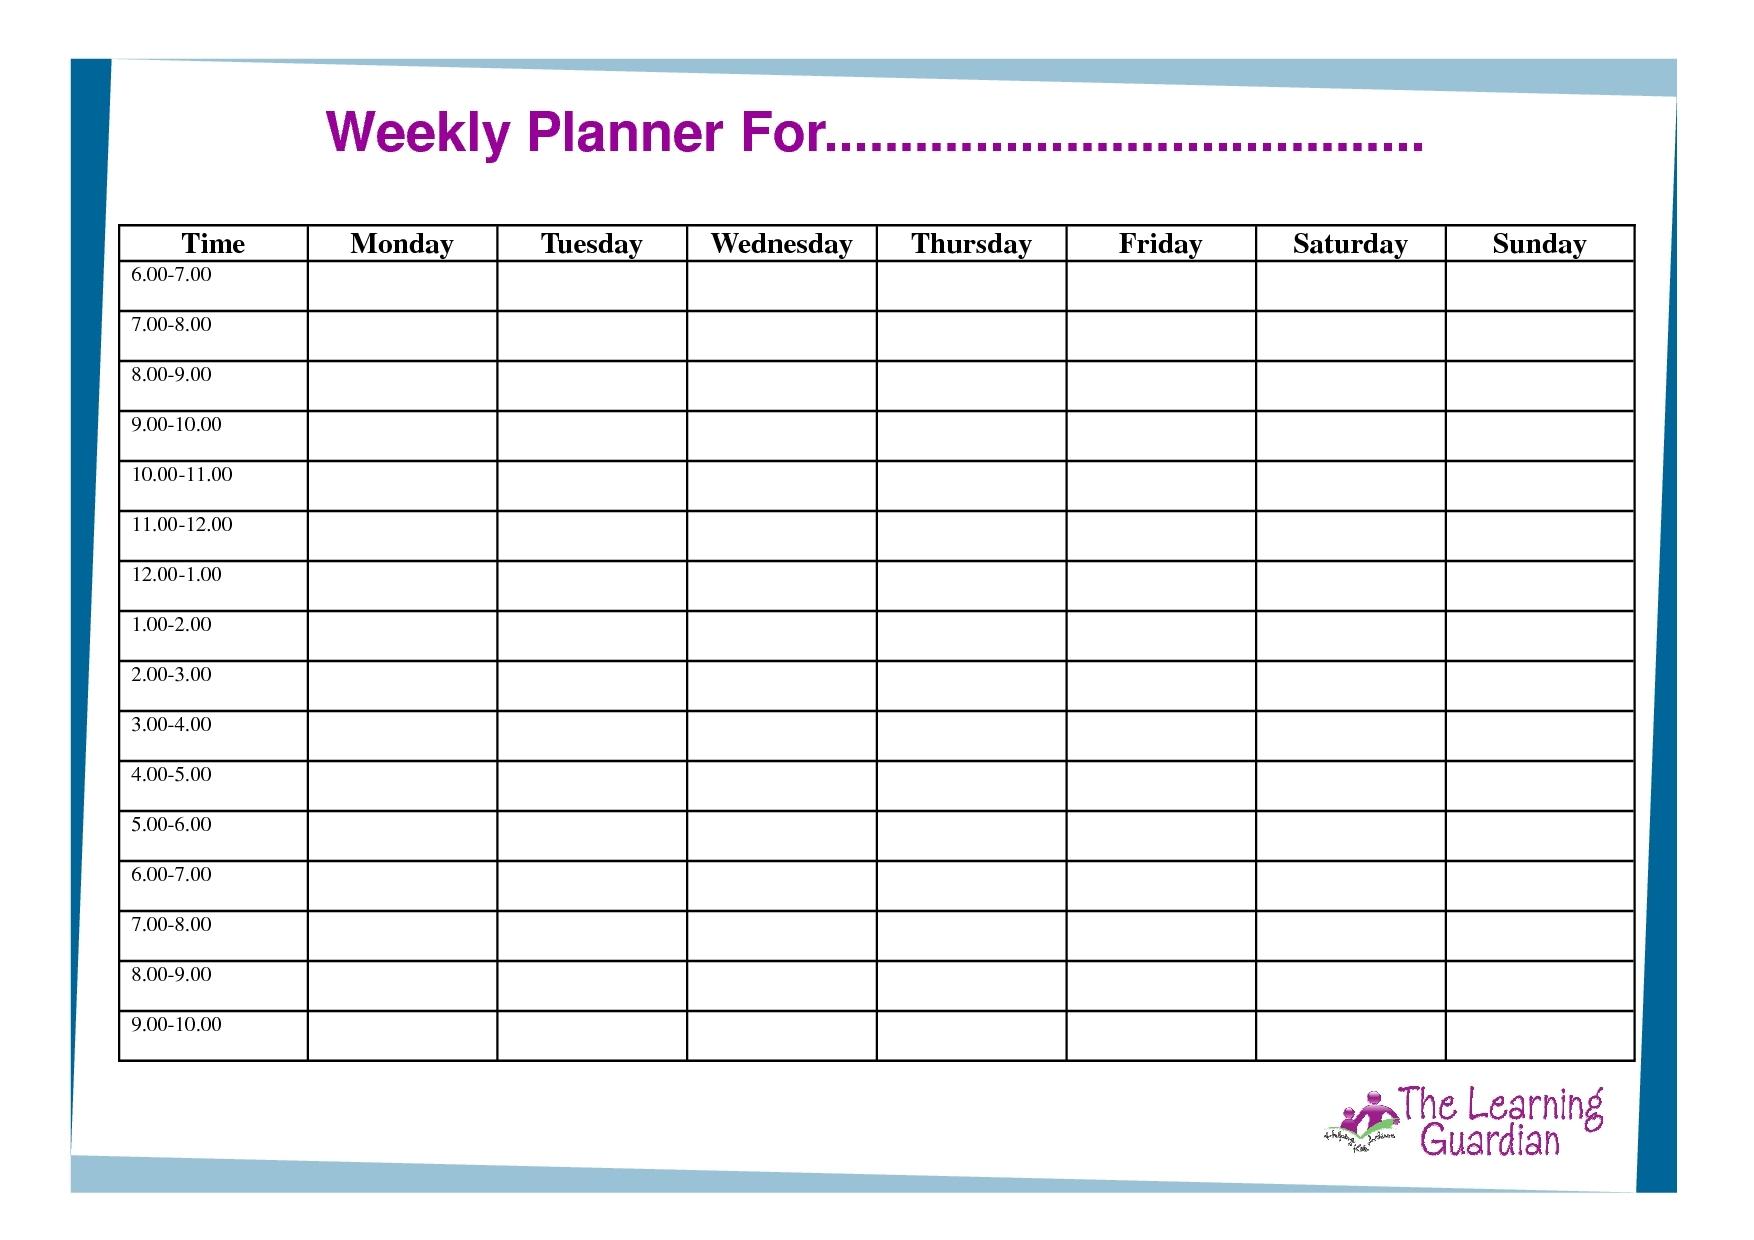 Printable Weekly Calendar Monday To Sunday - Template